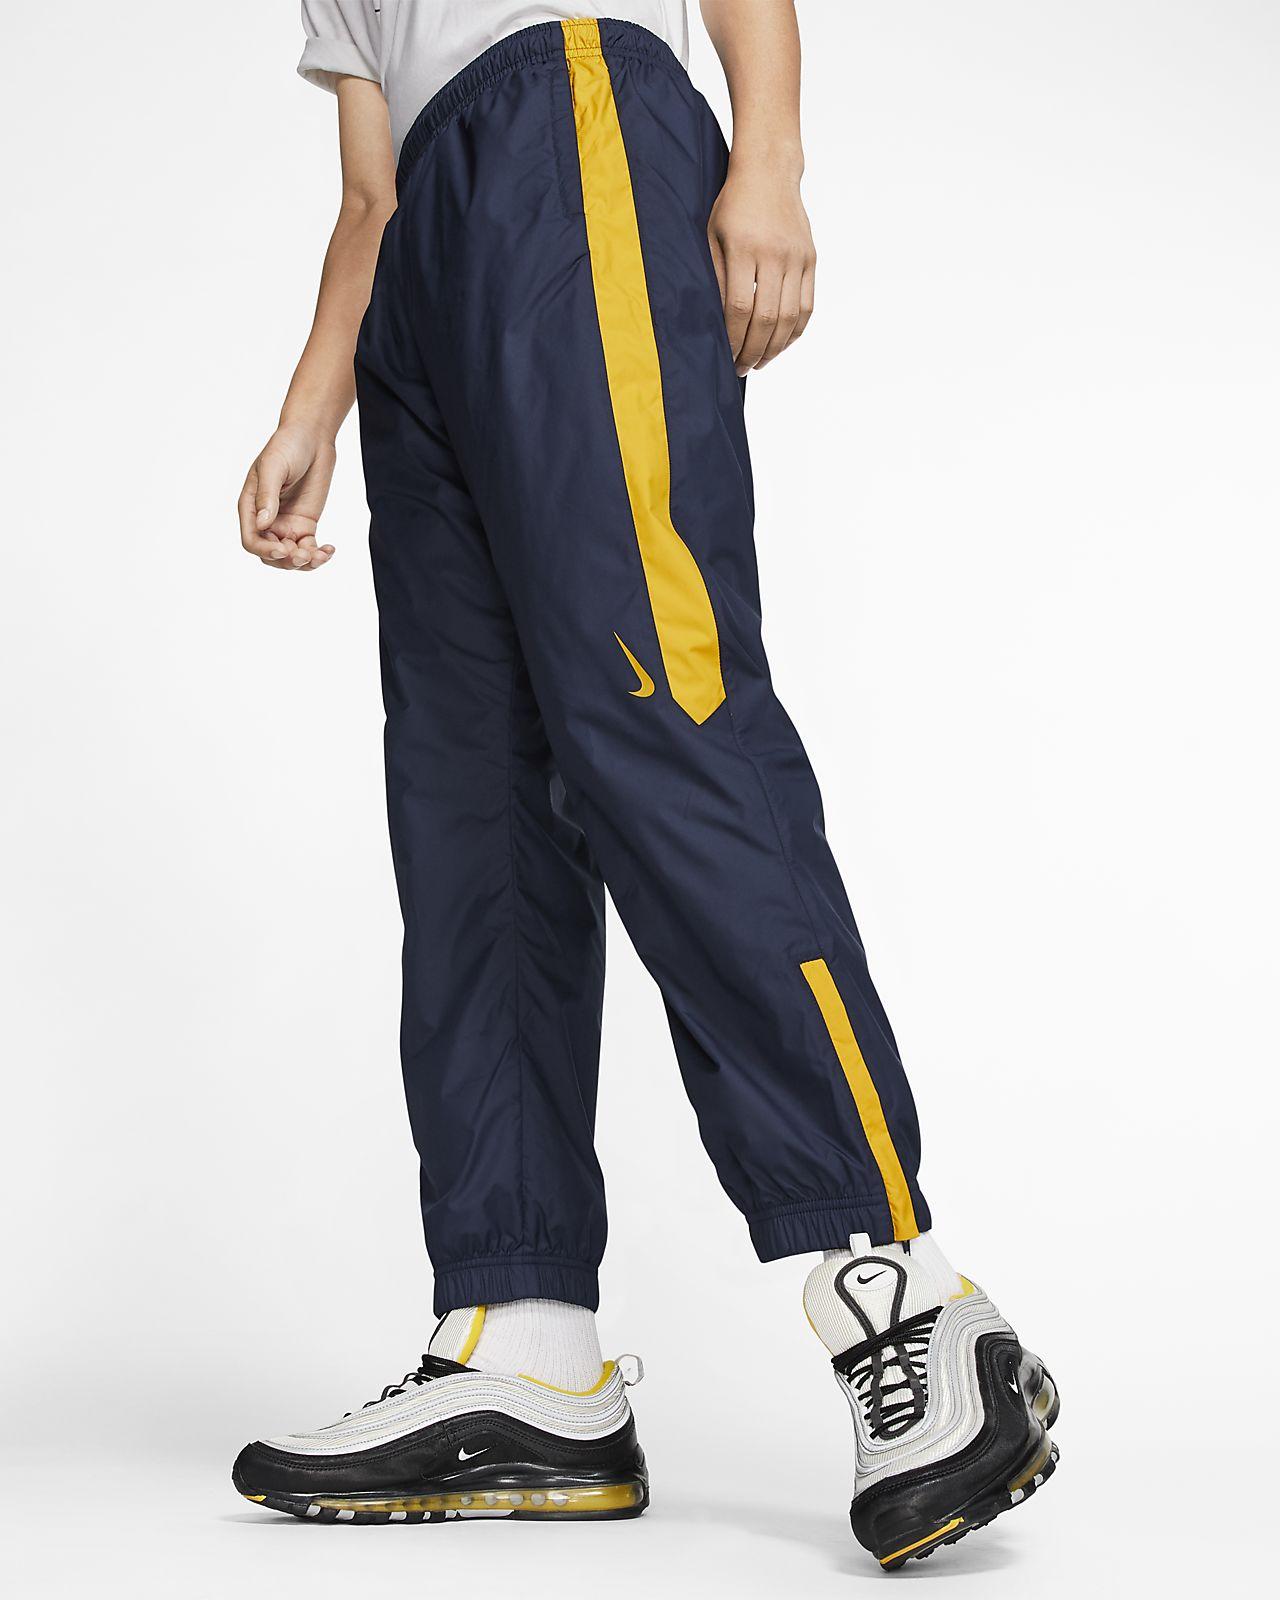 Nike Exclusive Black Polyknit Track Pants in 2019 | Nike